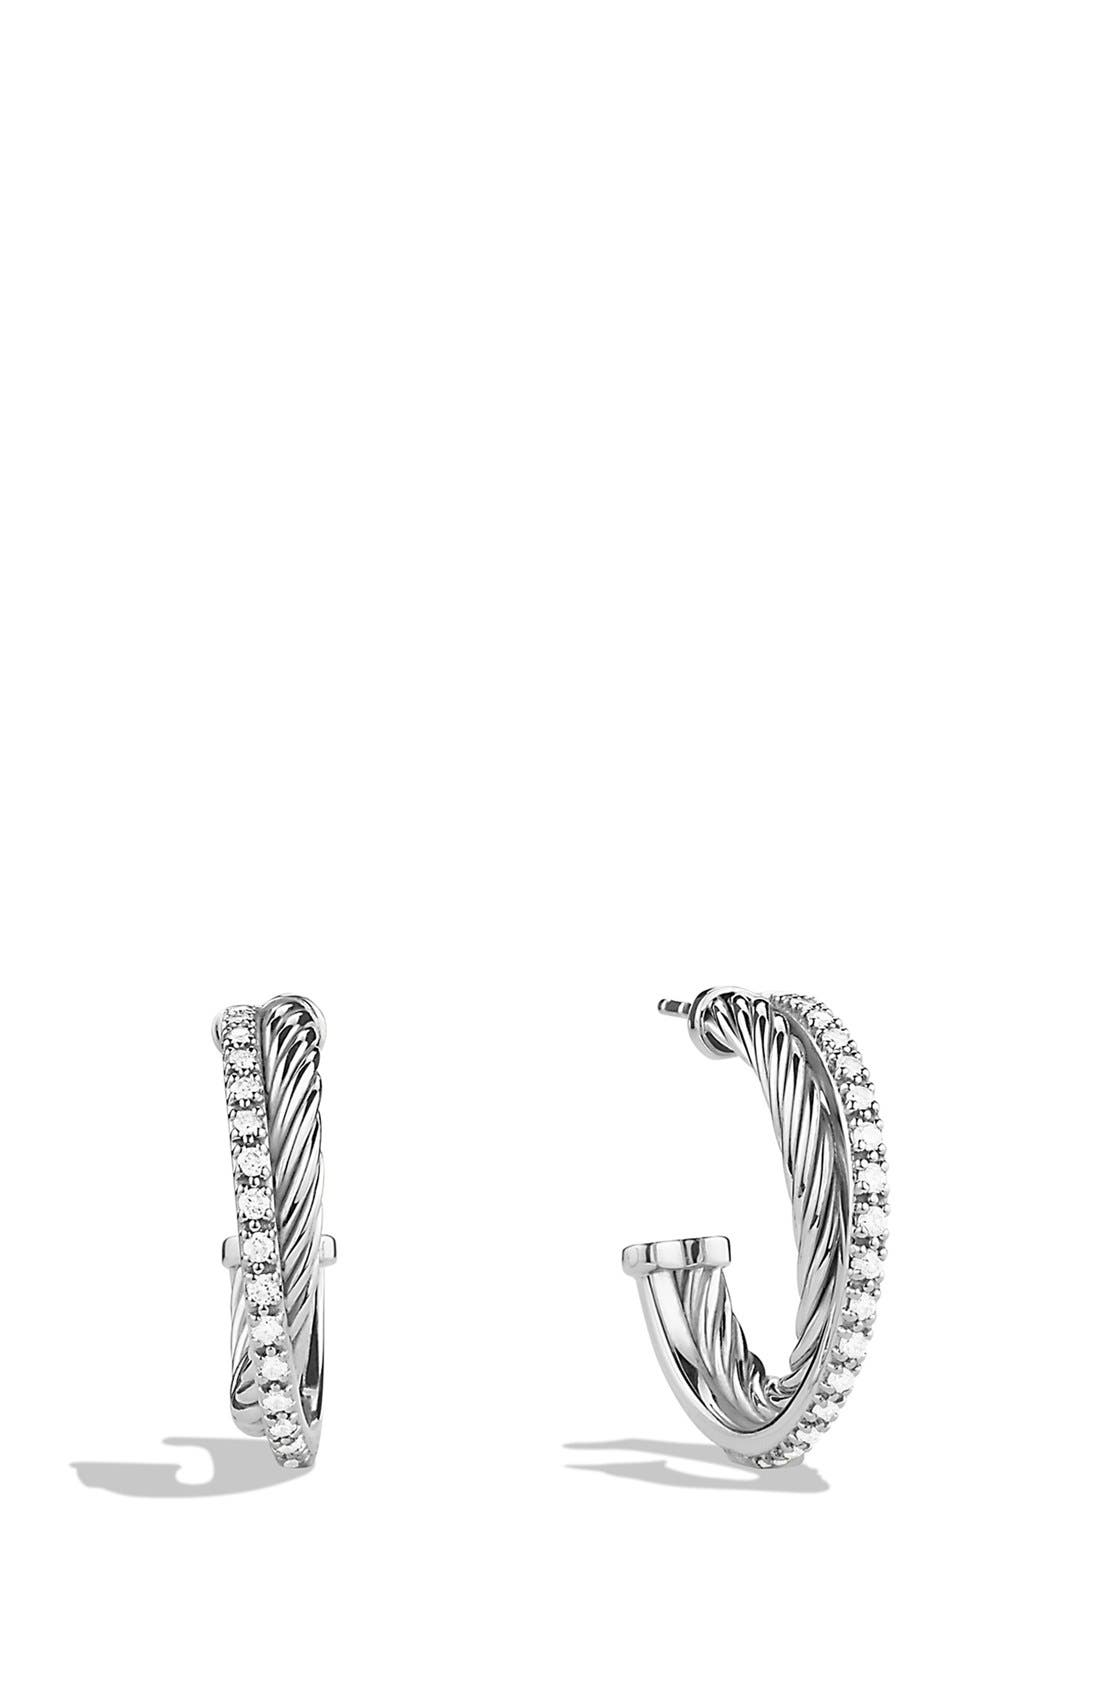 Main Image - David Yurman 'Crossover' Small Diamond Hoop Earrings